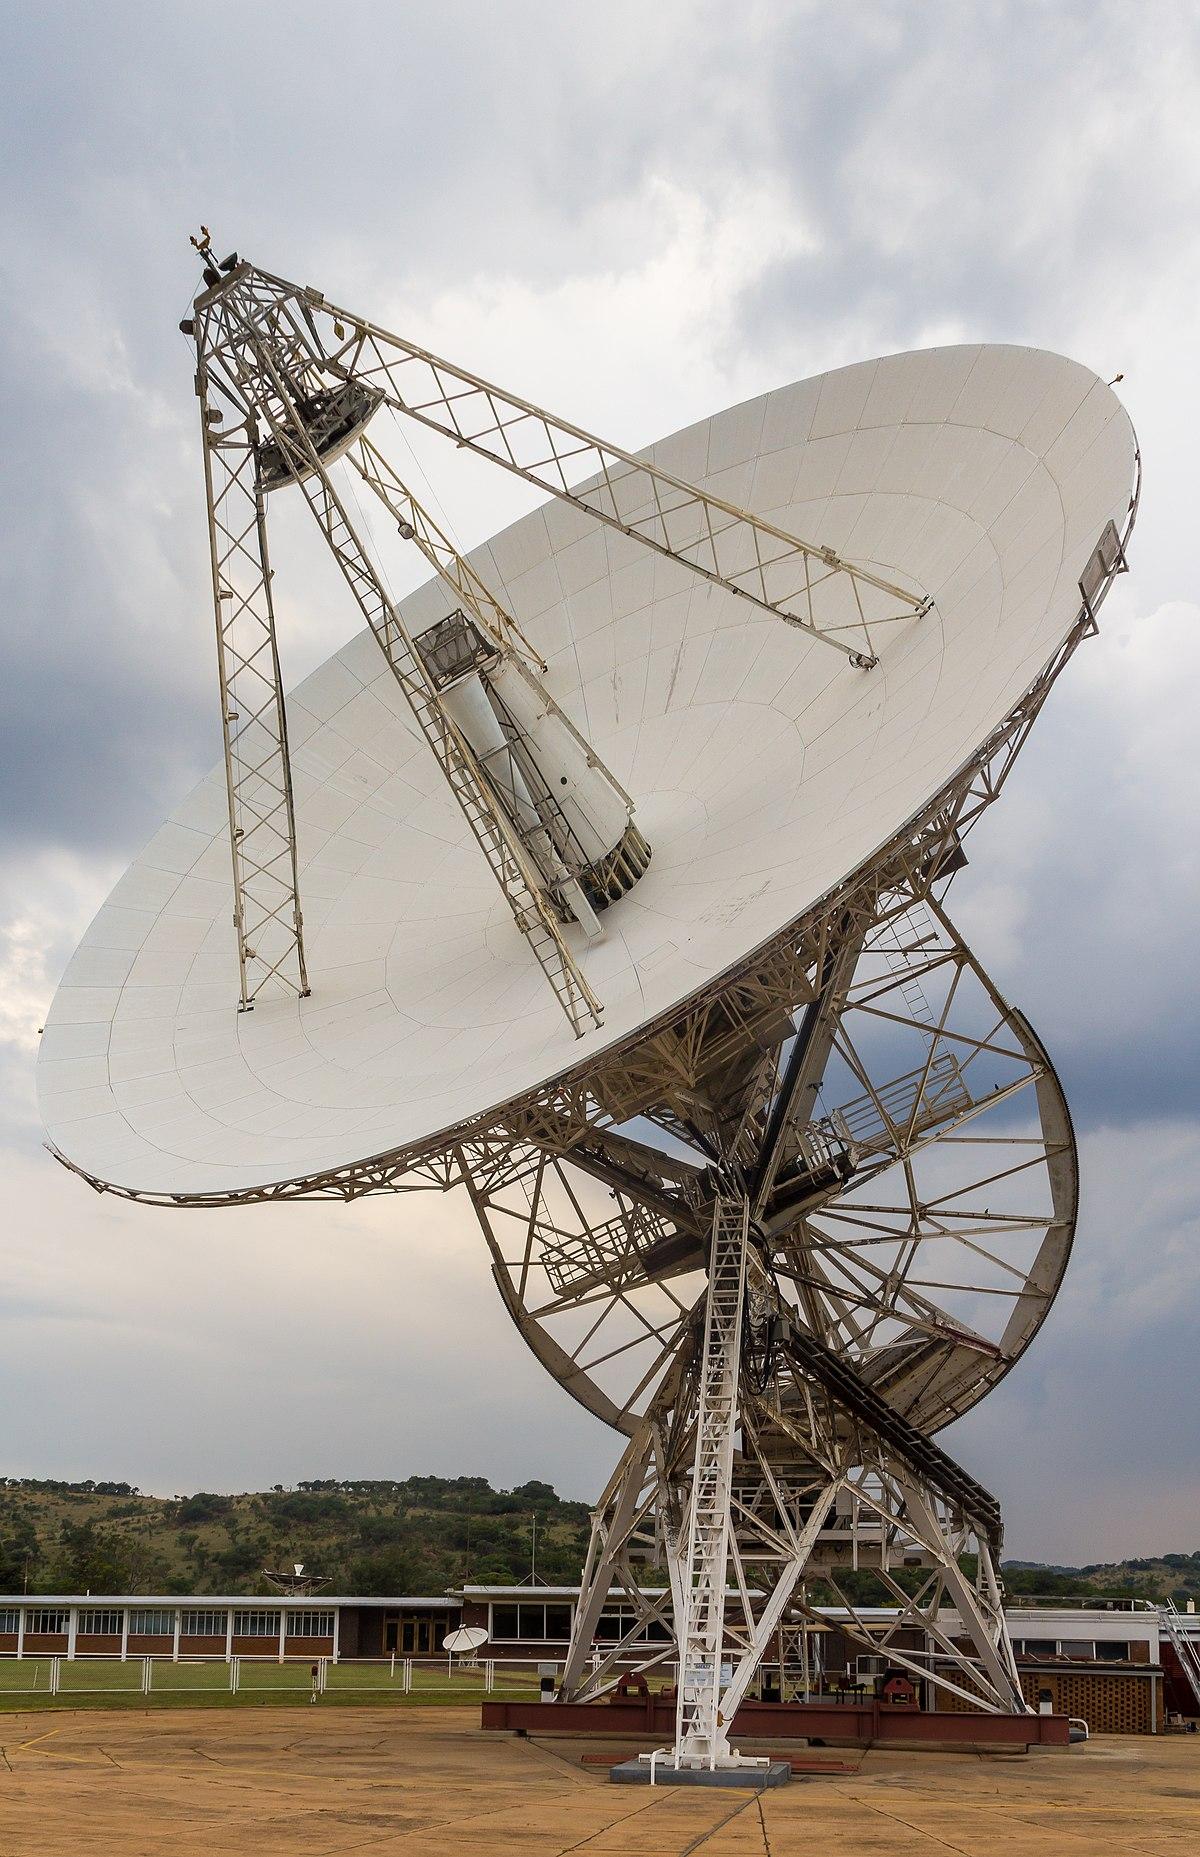 hartebeesthoek radio astronomy observatory wikipedia